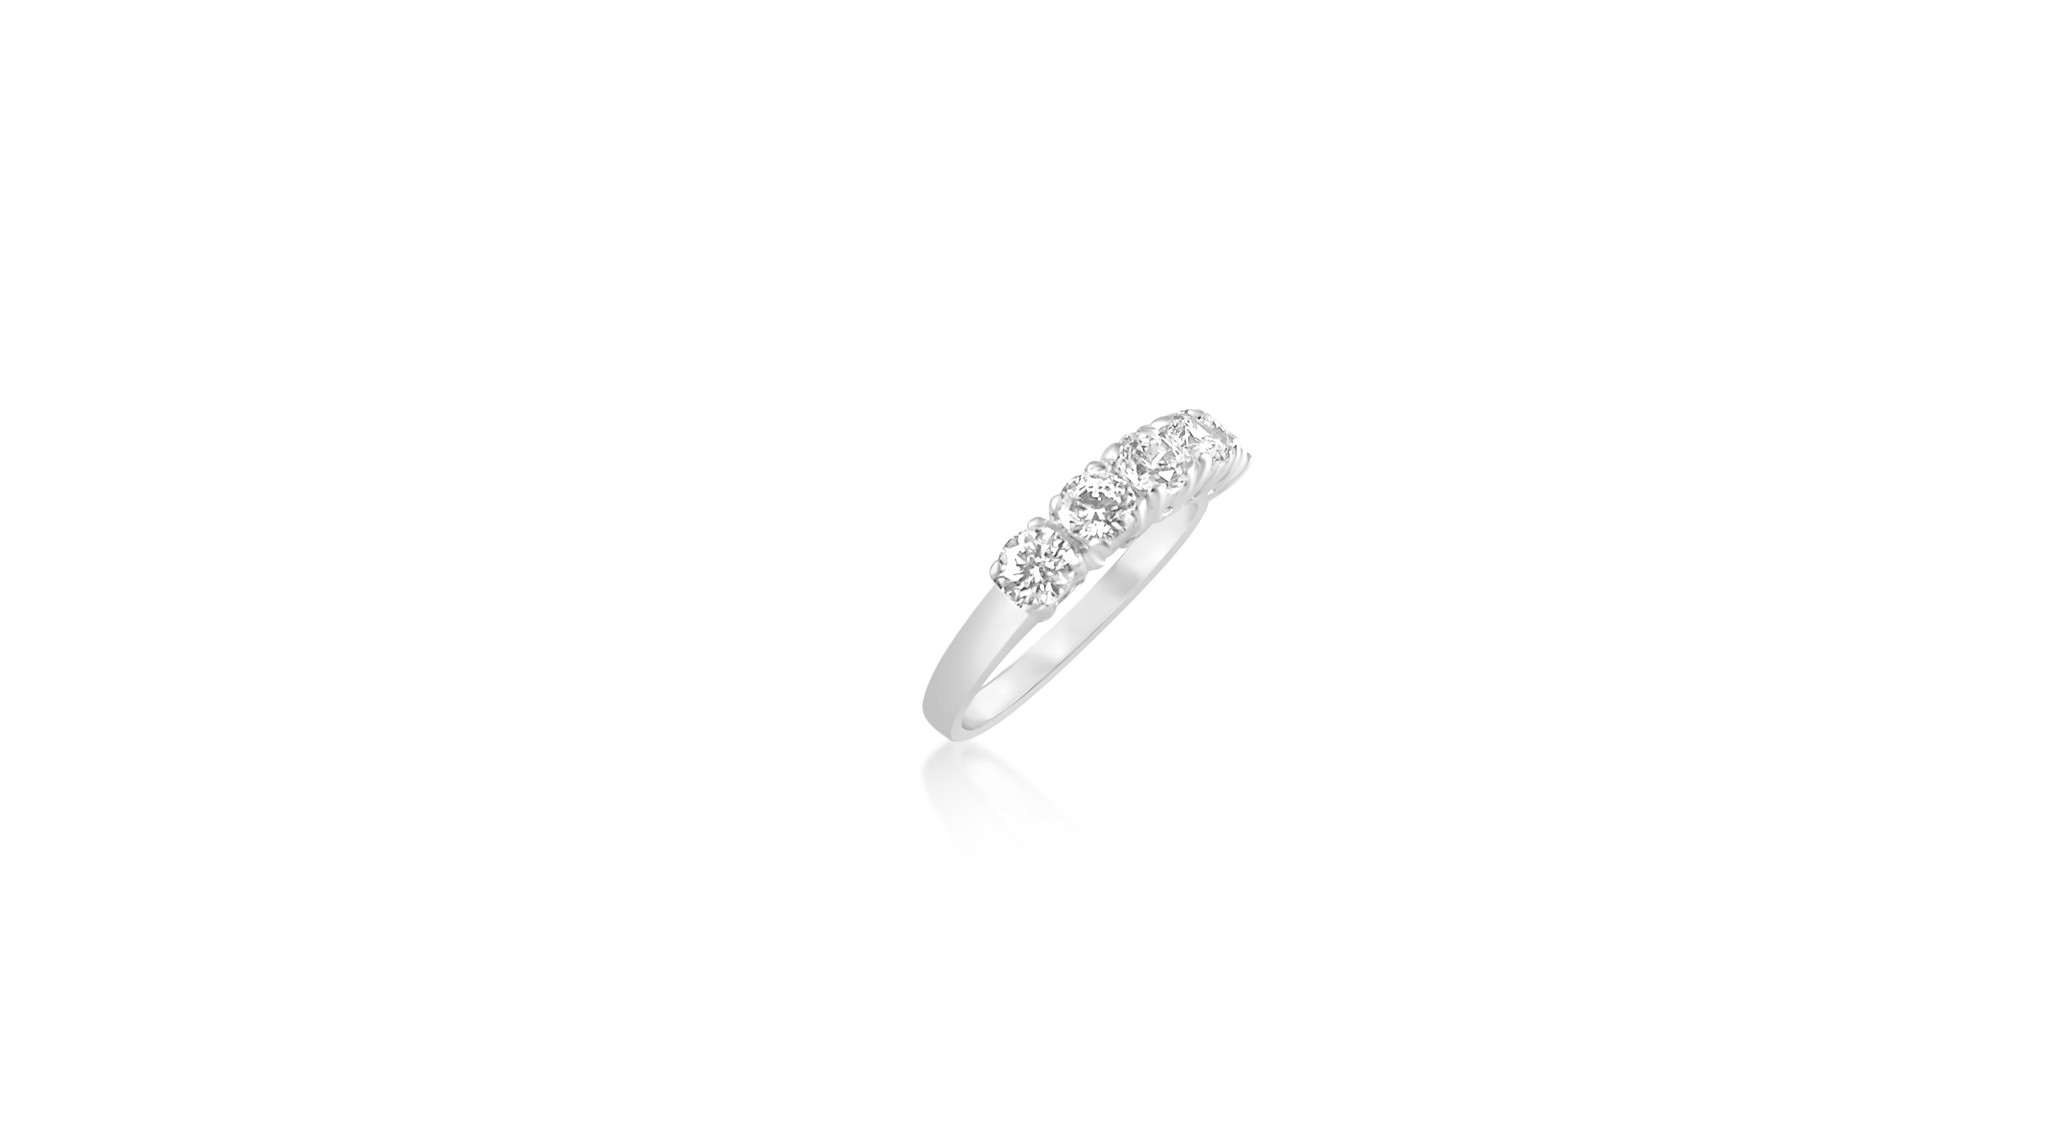 18 karat white gold ring with zirconia